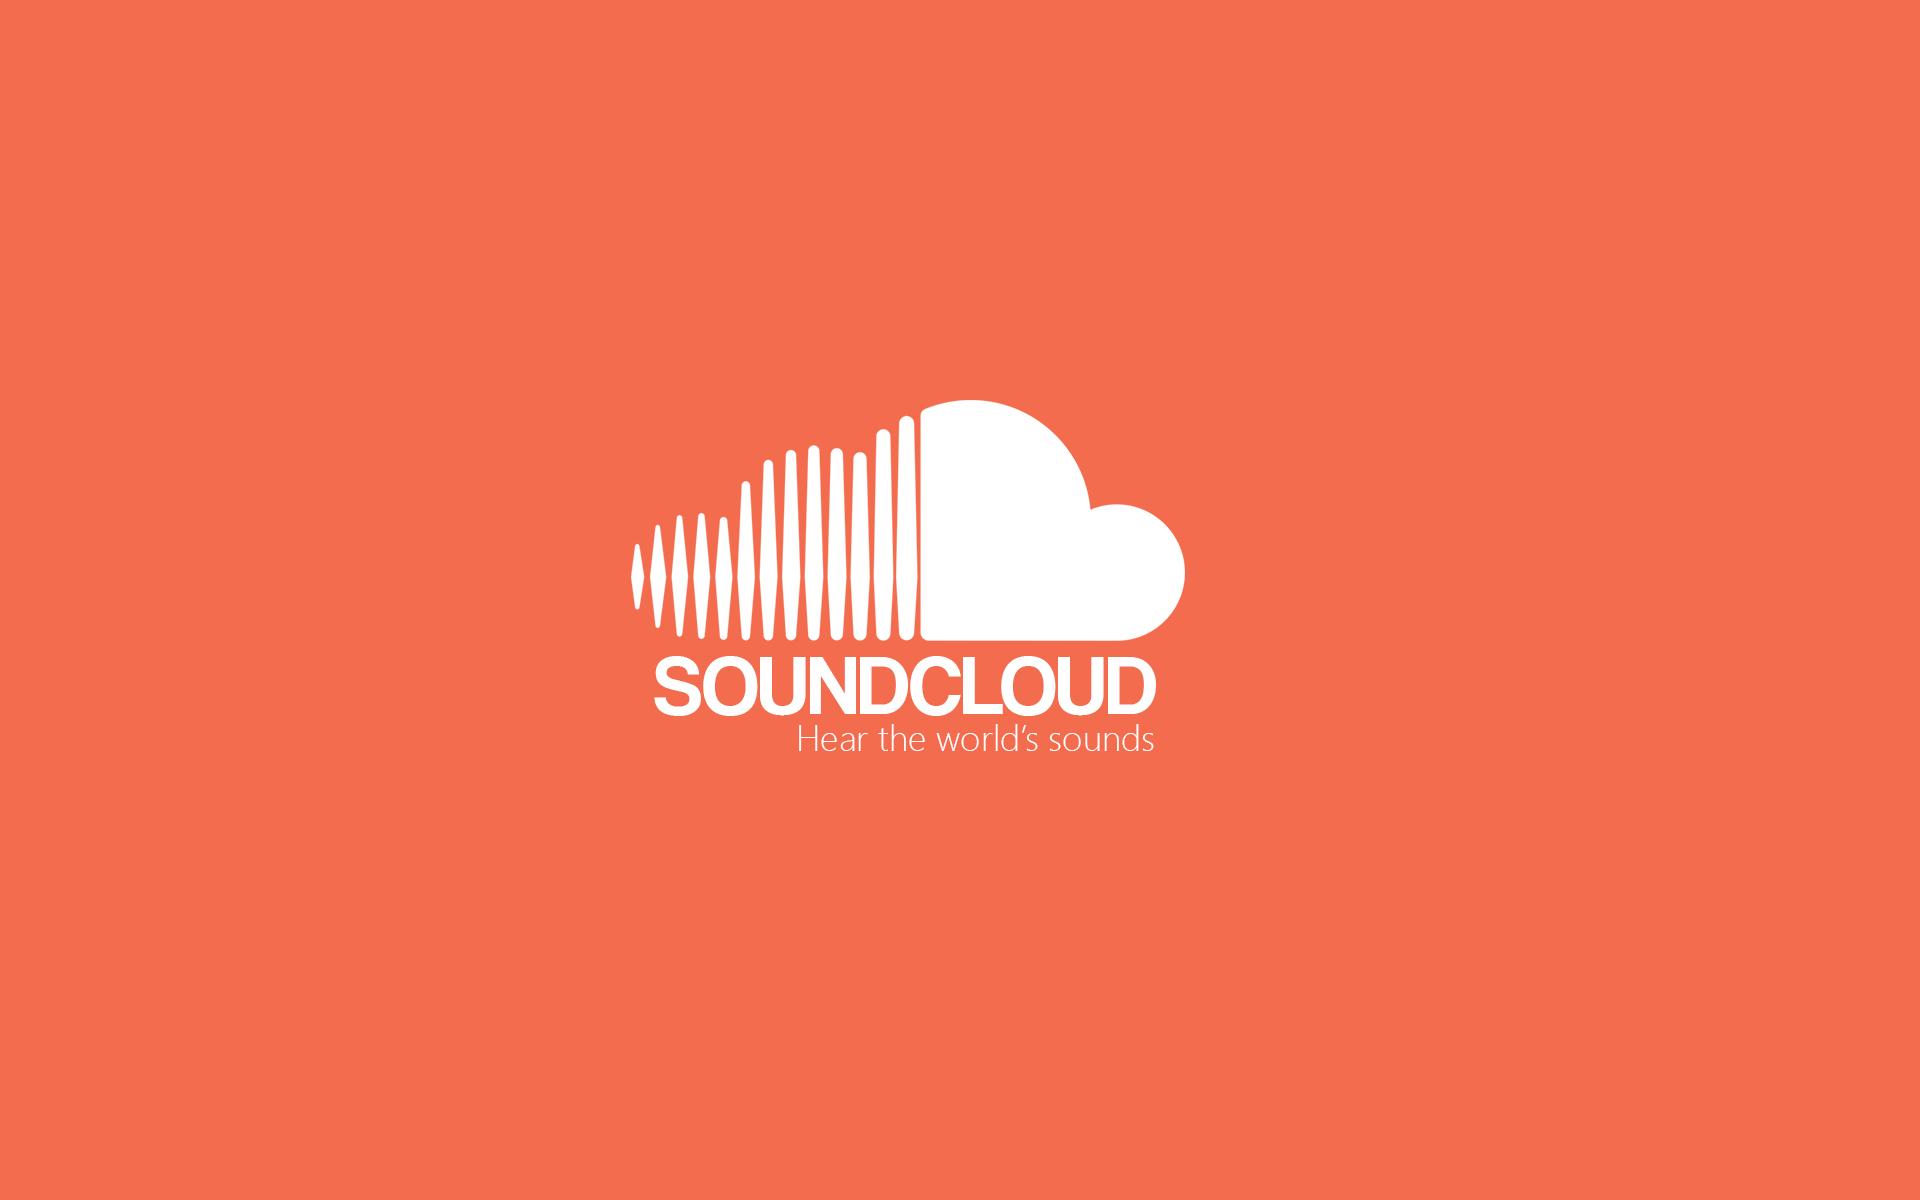 Soundcloud wallpaper by asproiugabi 1920x1200